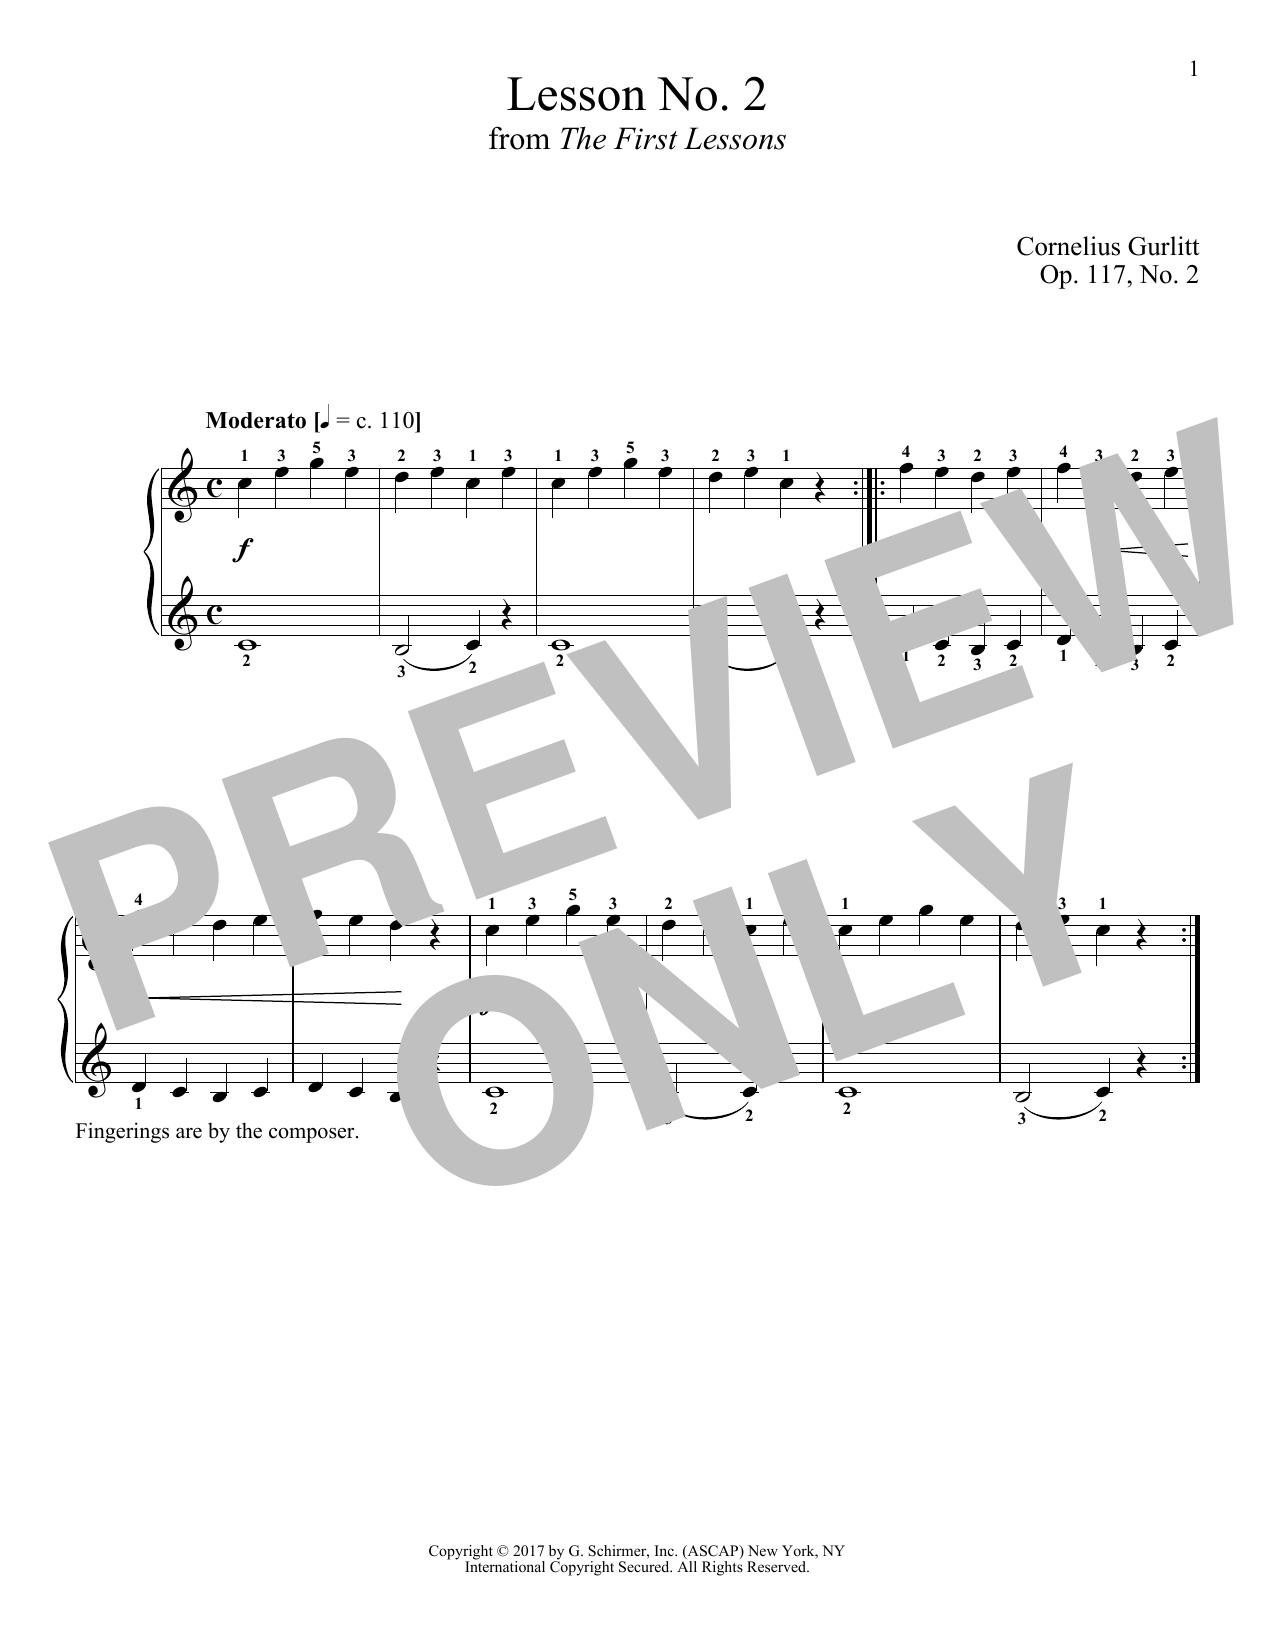 Cornelius Gurlitt Moderato, Op. 117, No. 2 sheet music notes and chords. Download Printable PDF.